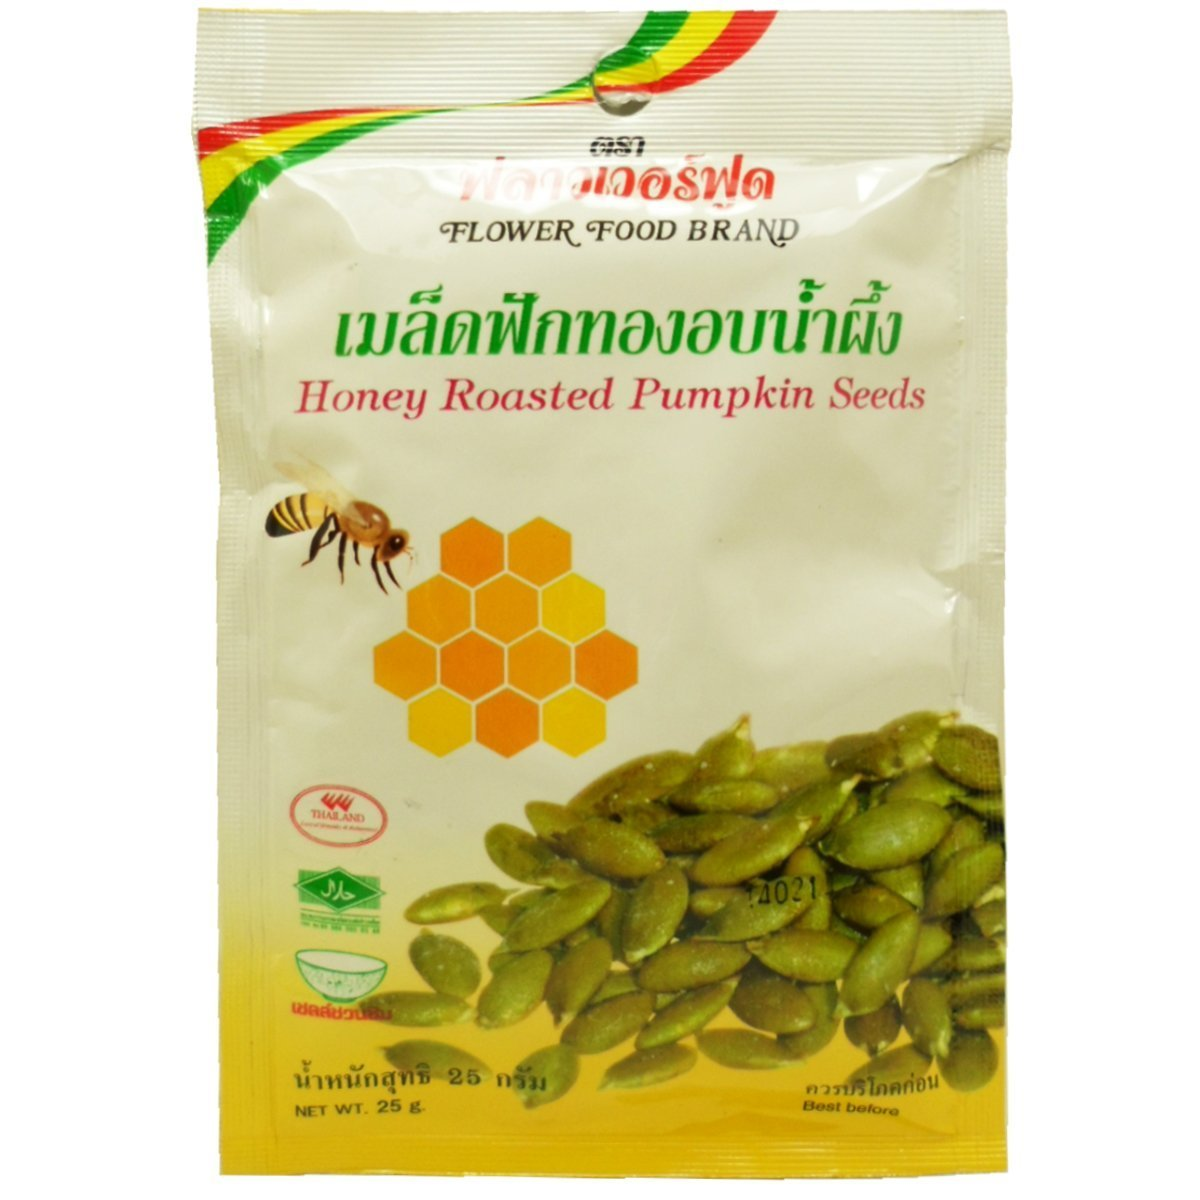 Honey Roasted Pumpkin Seeds Snack Net Wt Bags G 25 Super beauty product restock quality top 6 0.88 Superlatite X Oz